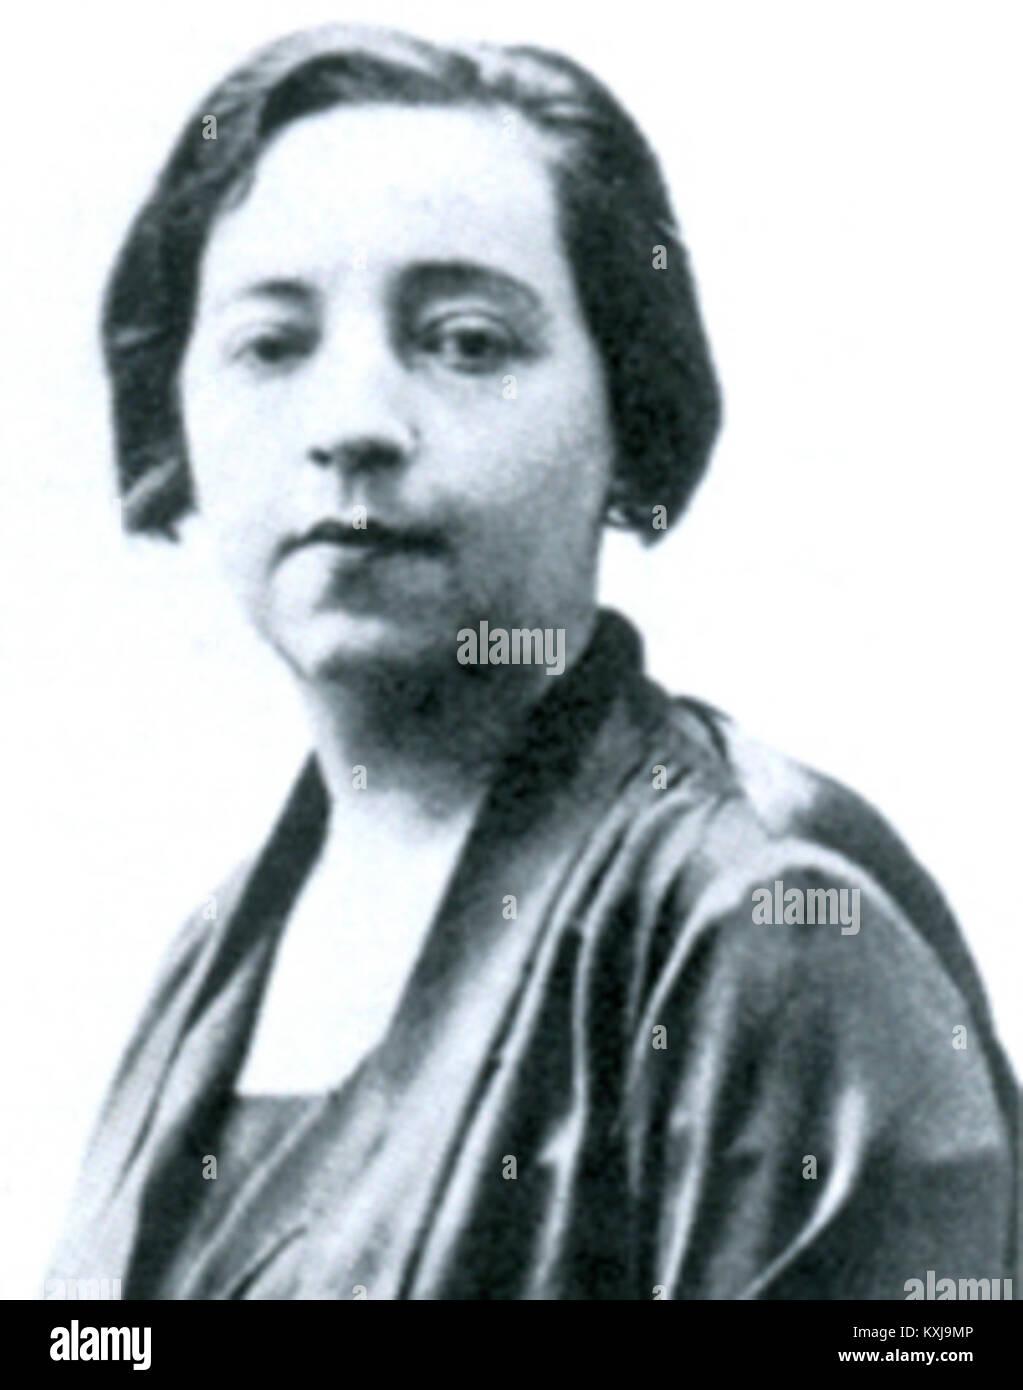 Lola Albright,Ethelreda Leopold Porn archive Norma Crane,Hiroko Hayashi